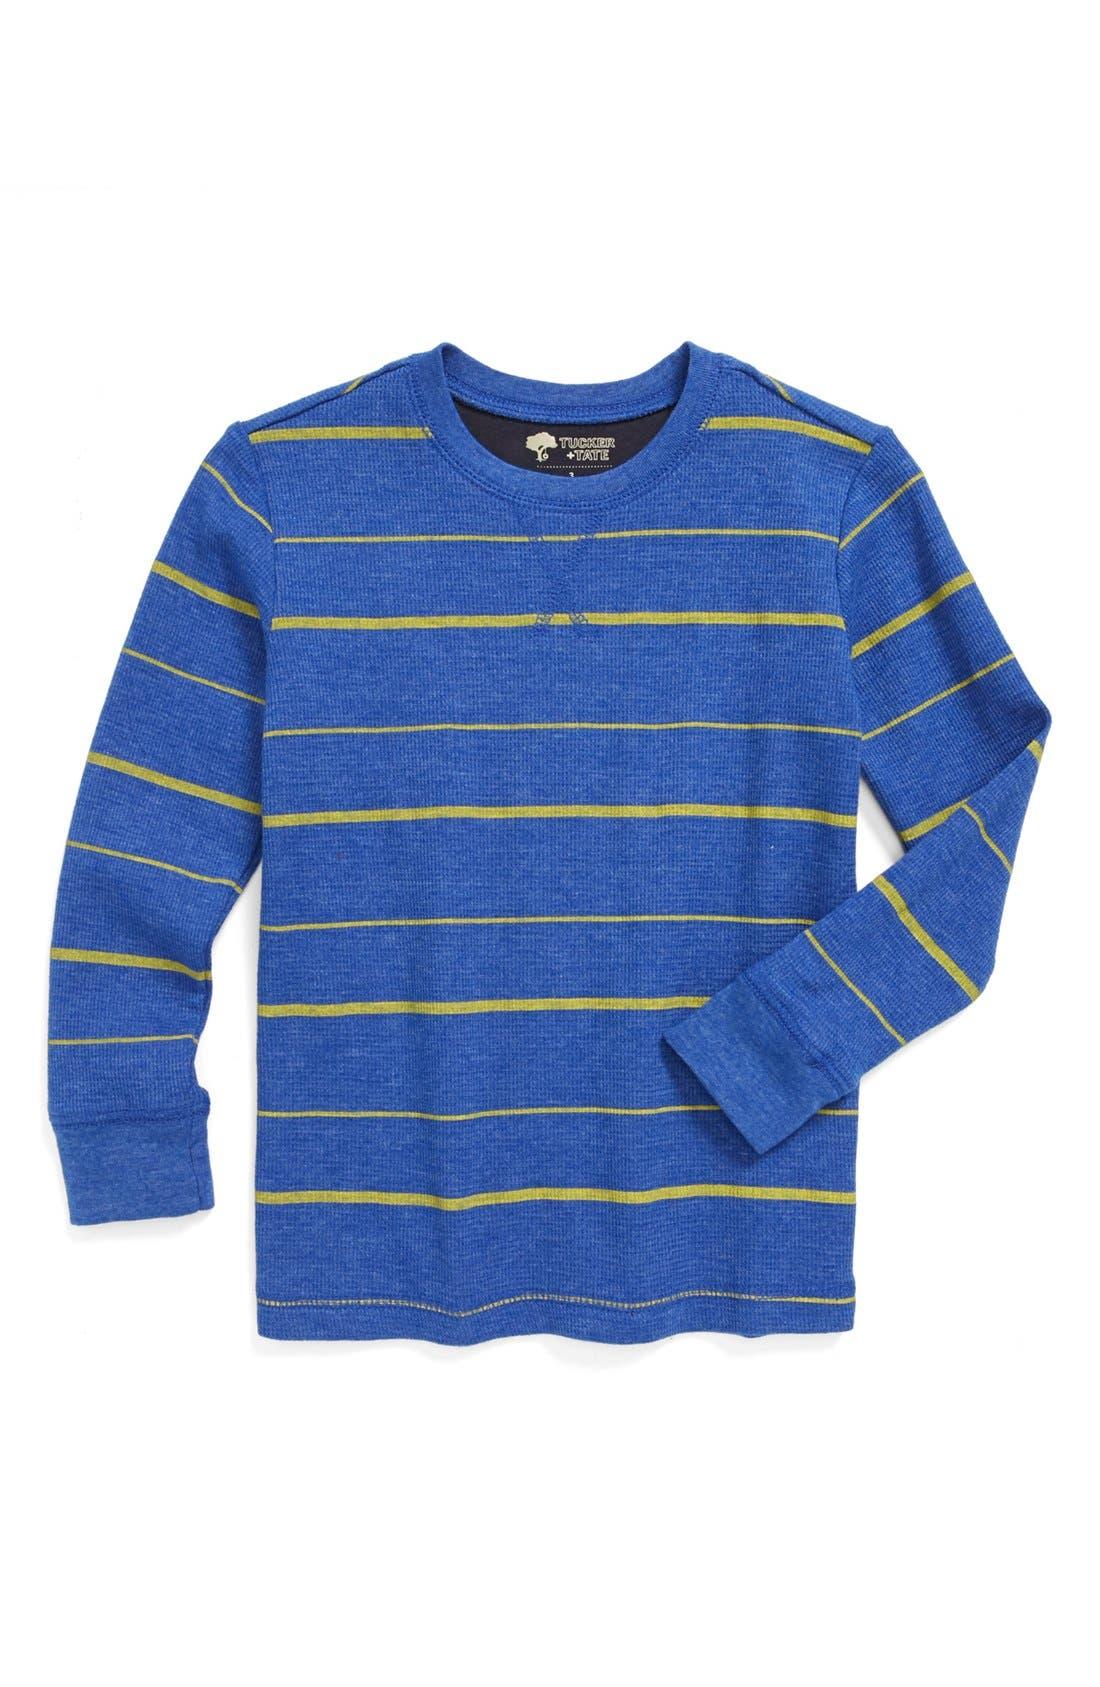 Main Image - Tucker + Tate 'Sultan' Print Long Sleeve T-Shirt (Toddler Boys)